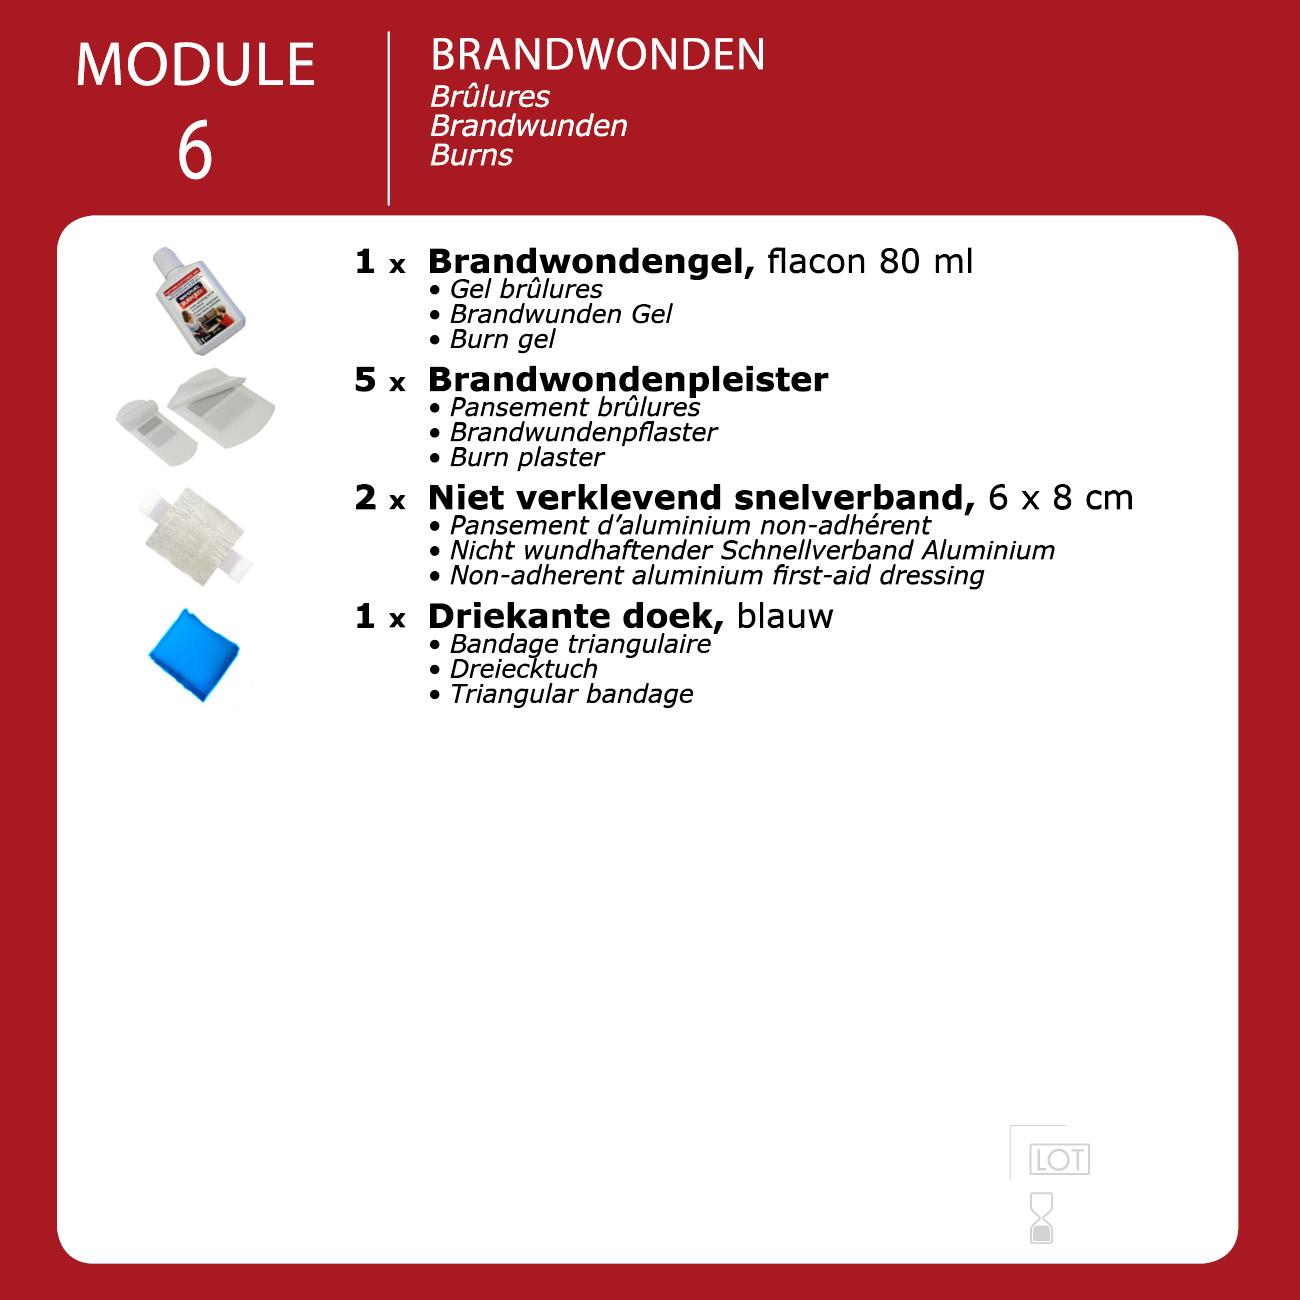 inhoud module industrie